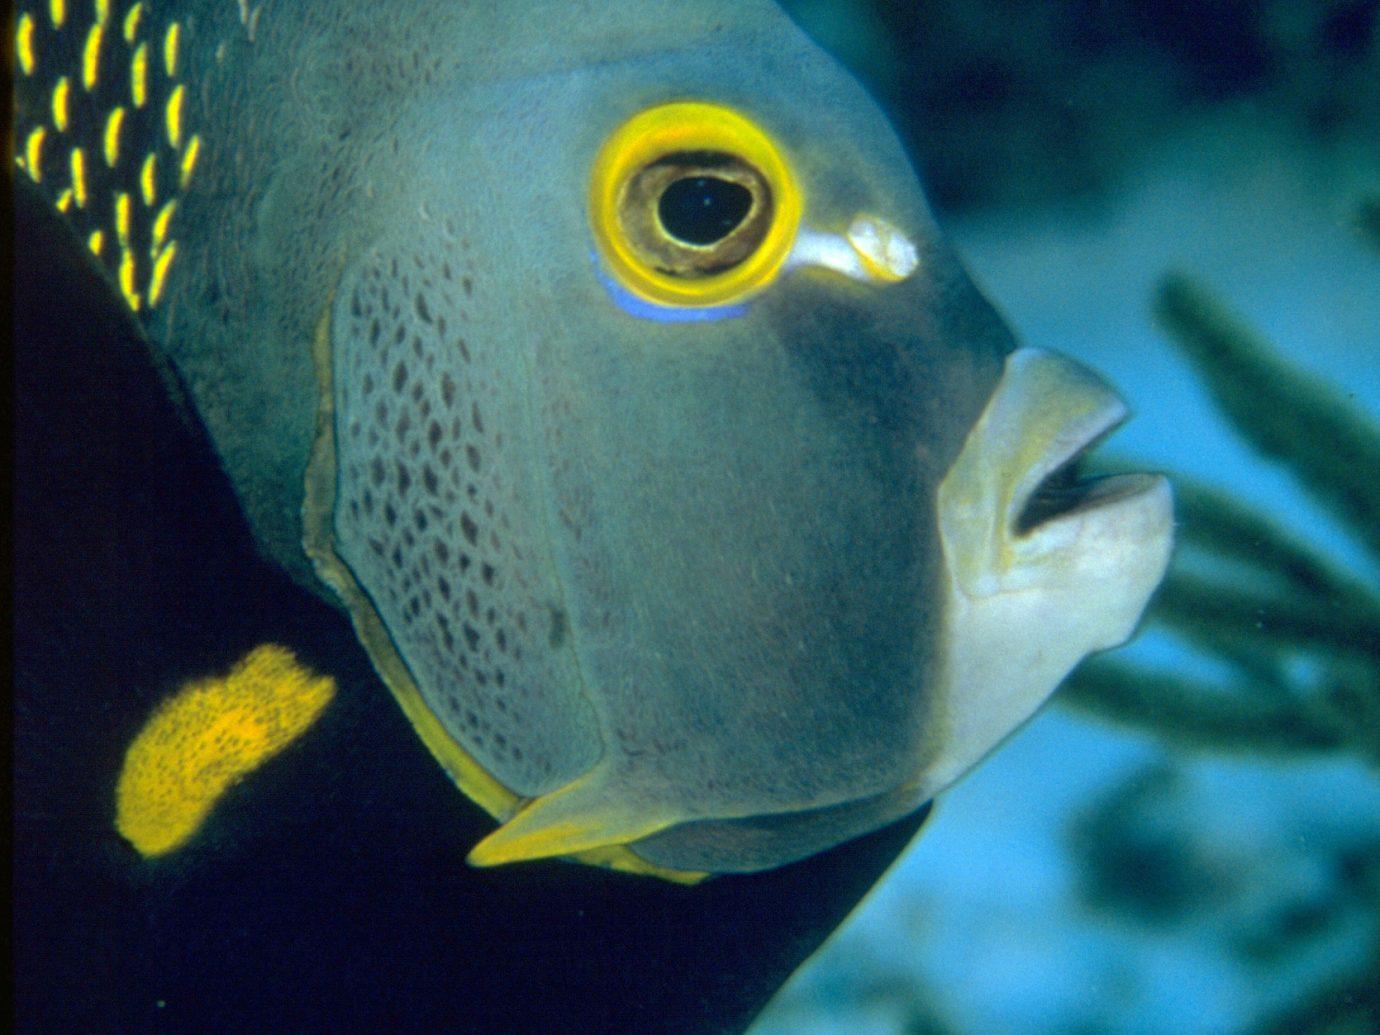 Trip Ideas fish animal blue marine biology underwater fauna biology yellow pomacanthidae spiny-finned fish reef coral reef fish aquarium black pomacentridae deep sea fish close